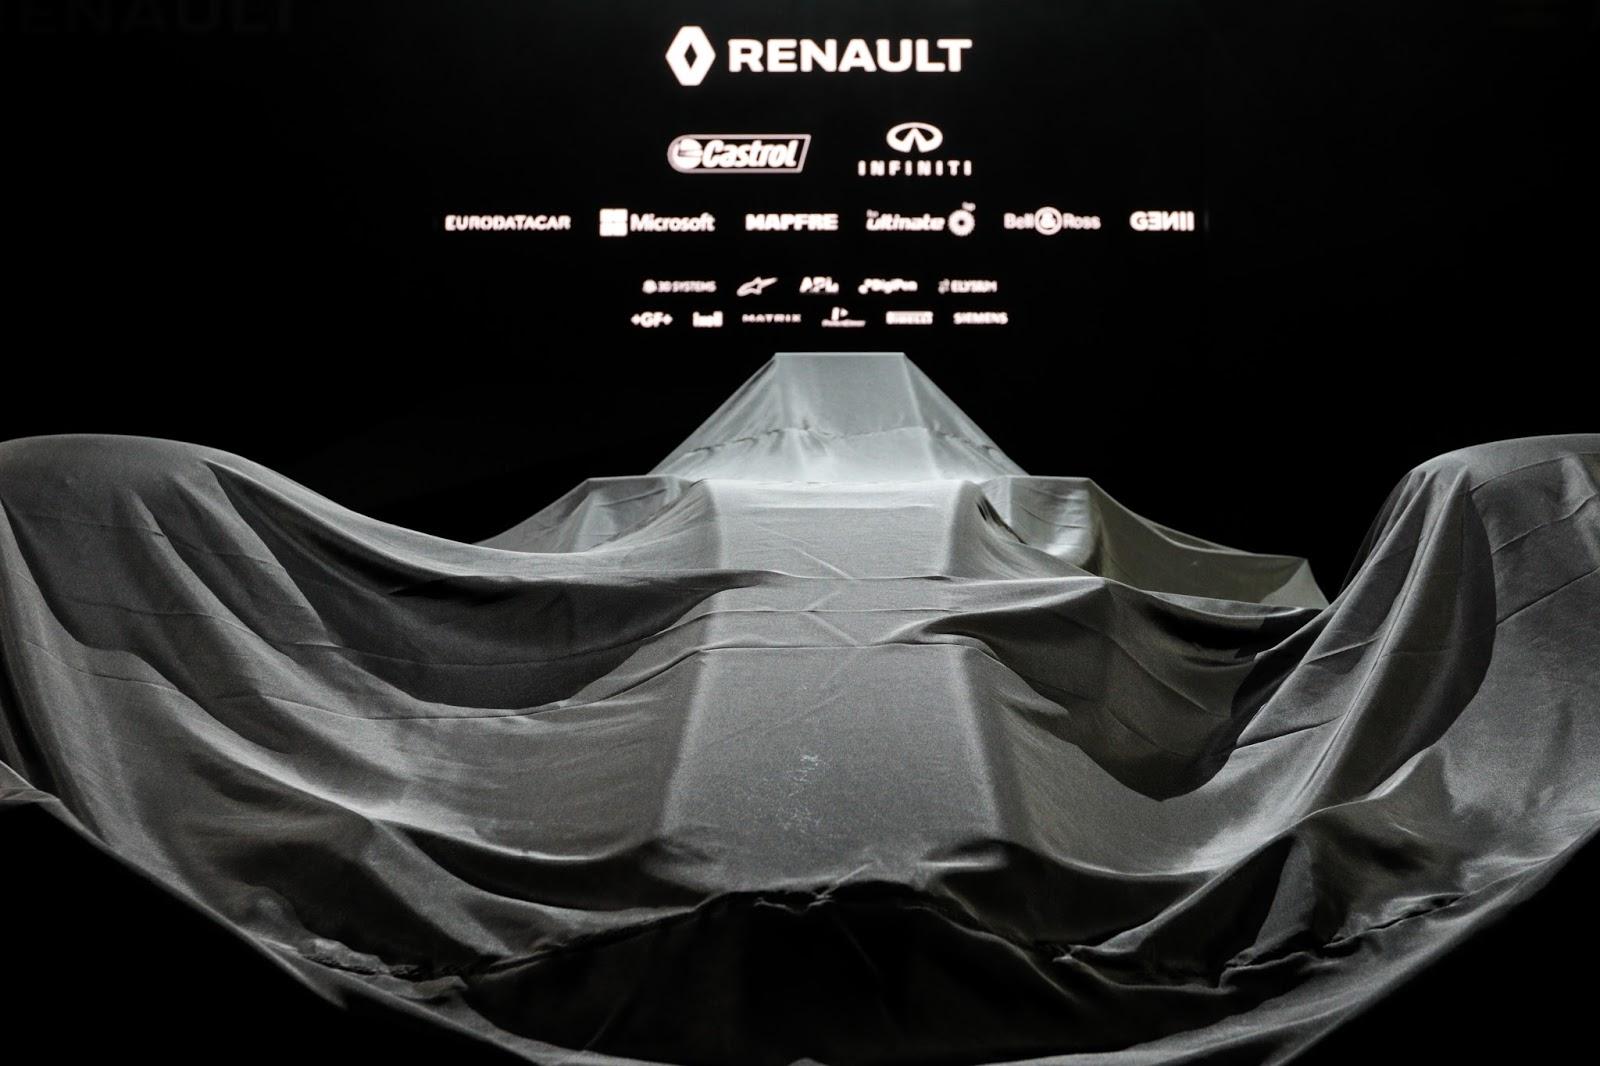 210217 RL 001 1 Η Renault Sport παρουσίασε το καινούργιο της μονοθέσιο, την R.S.17 F1, Formula 1, Renault, Renault Sport Formula 1 Team, videos